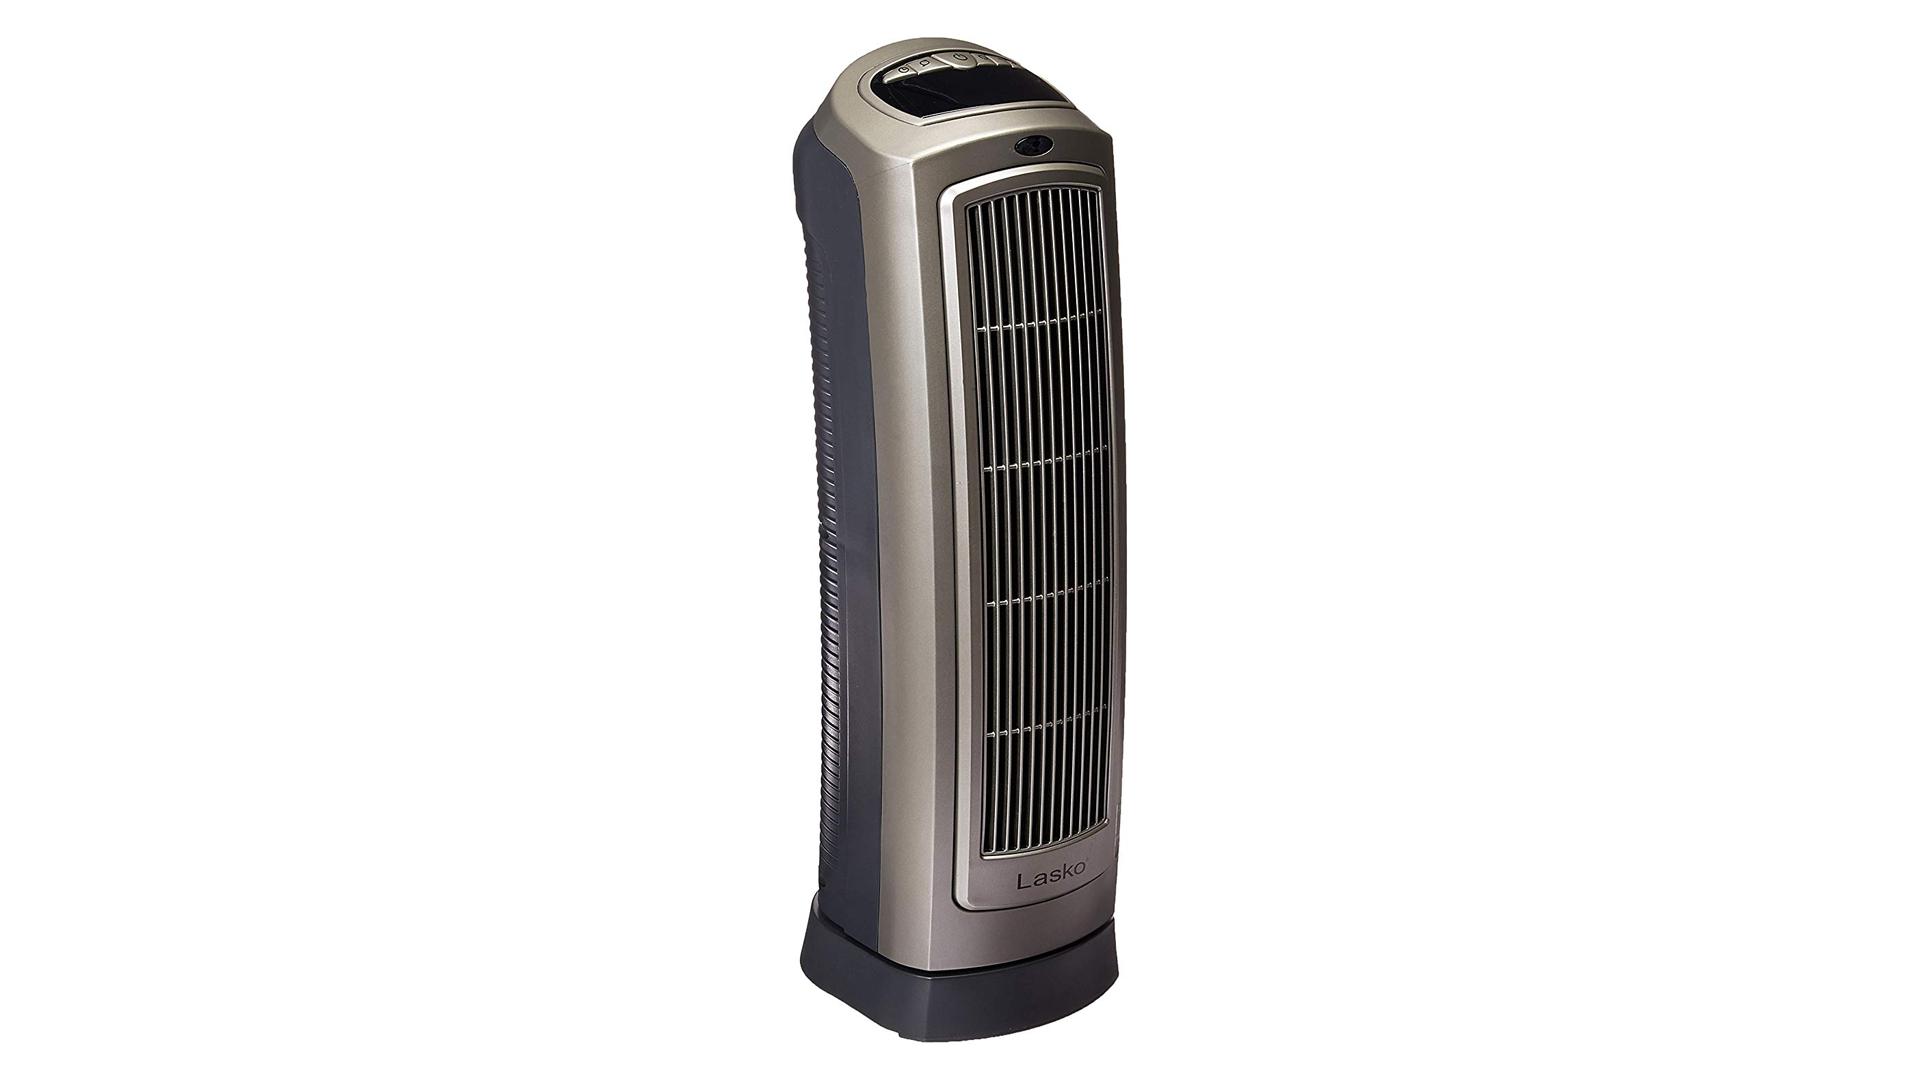 The Lasko 755320 Oscillating Space Heater.